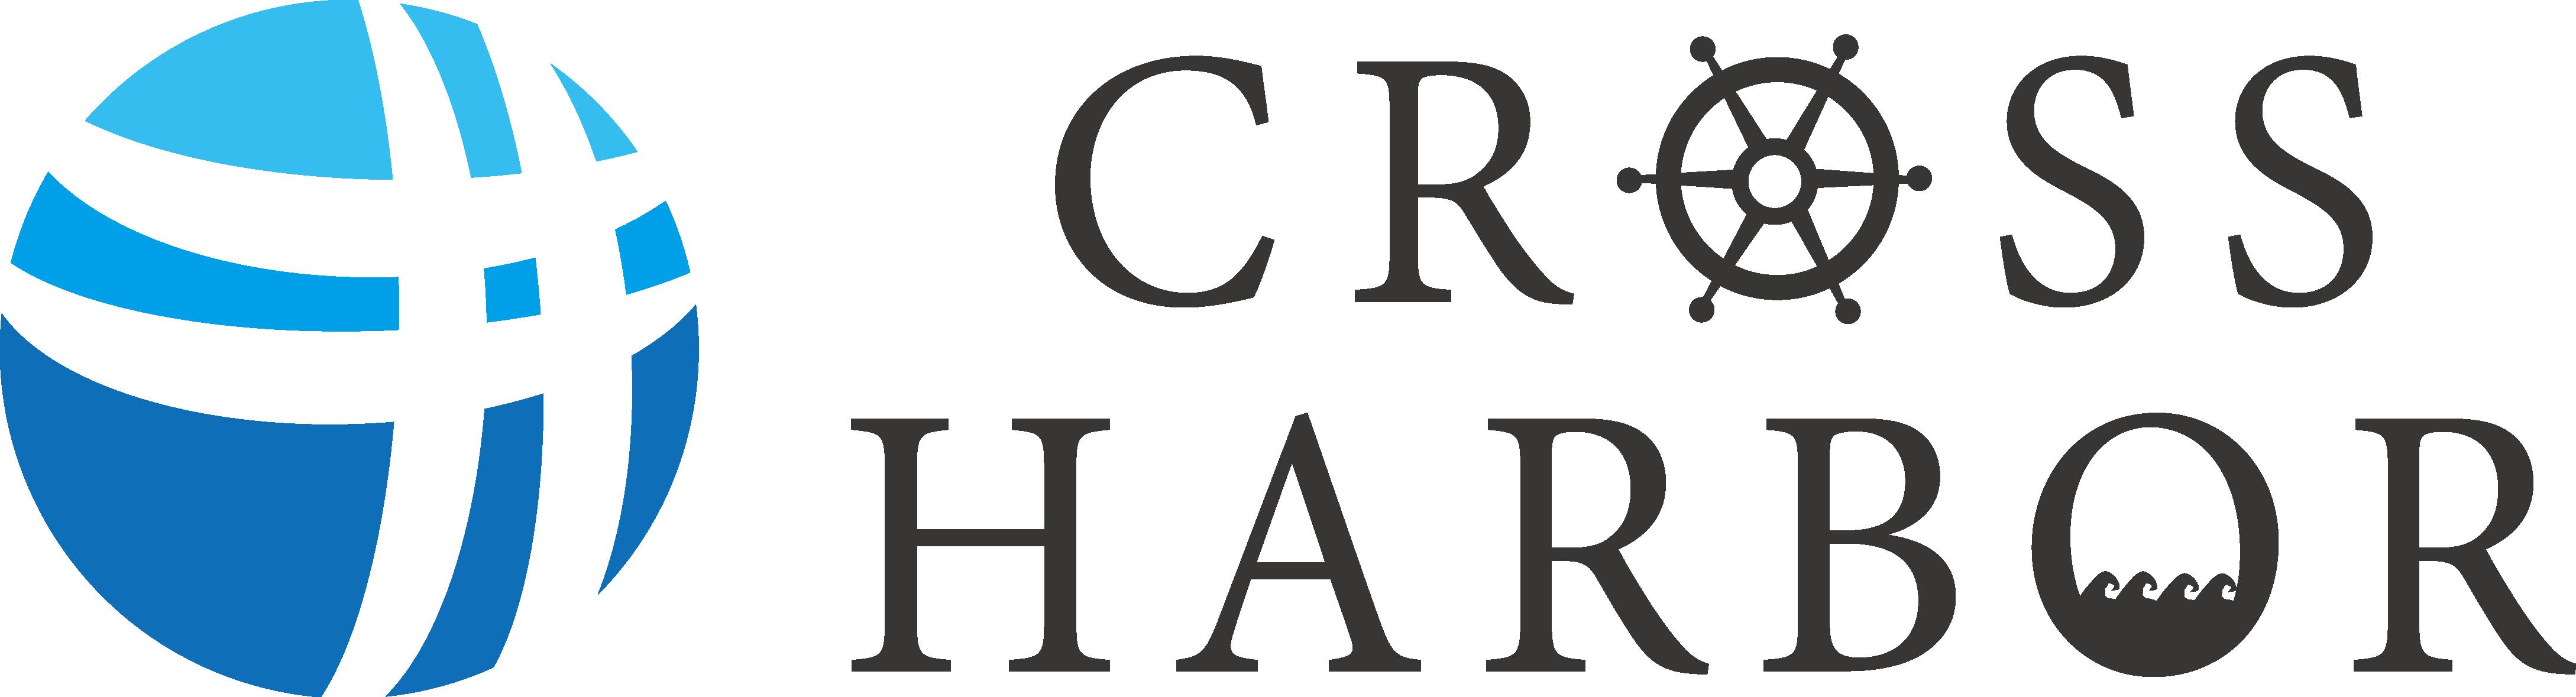 CROSS HARBOR